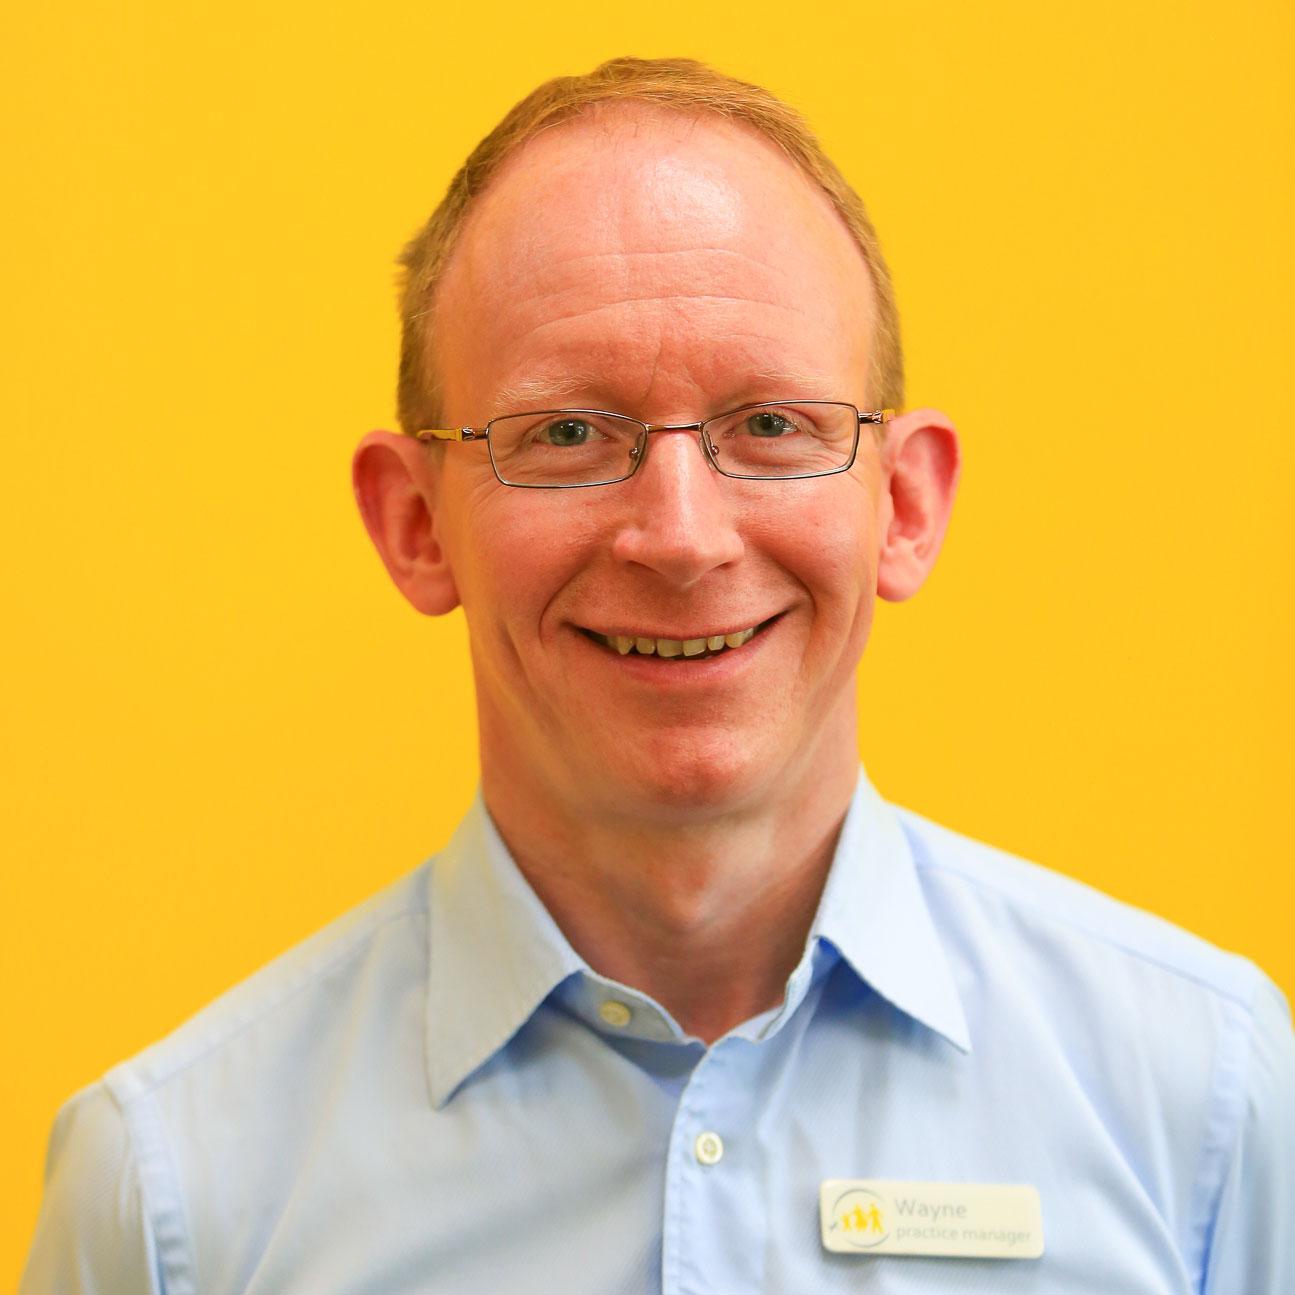 Wayne Smith-Gillard